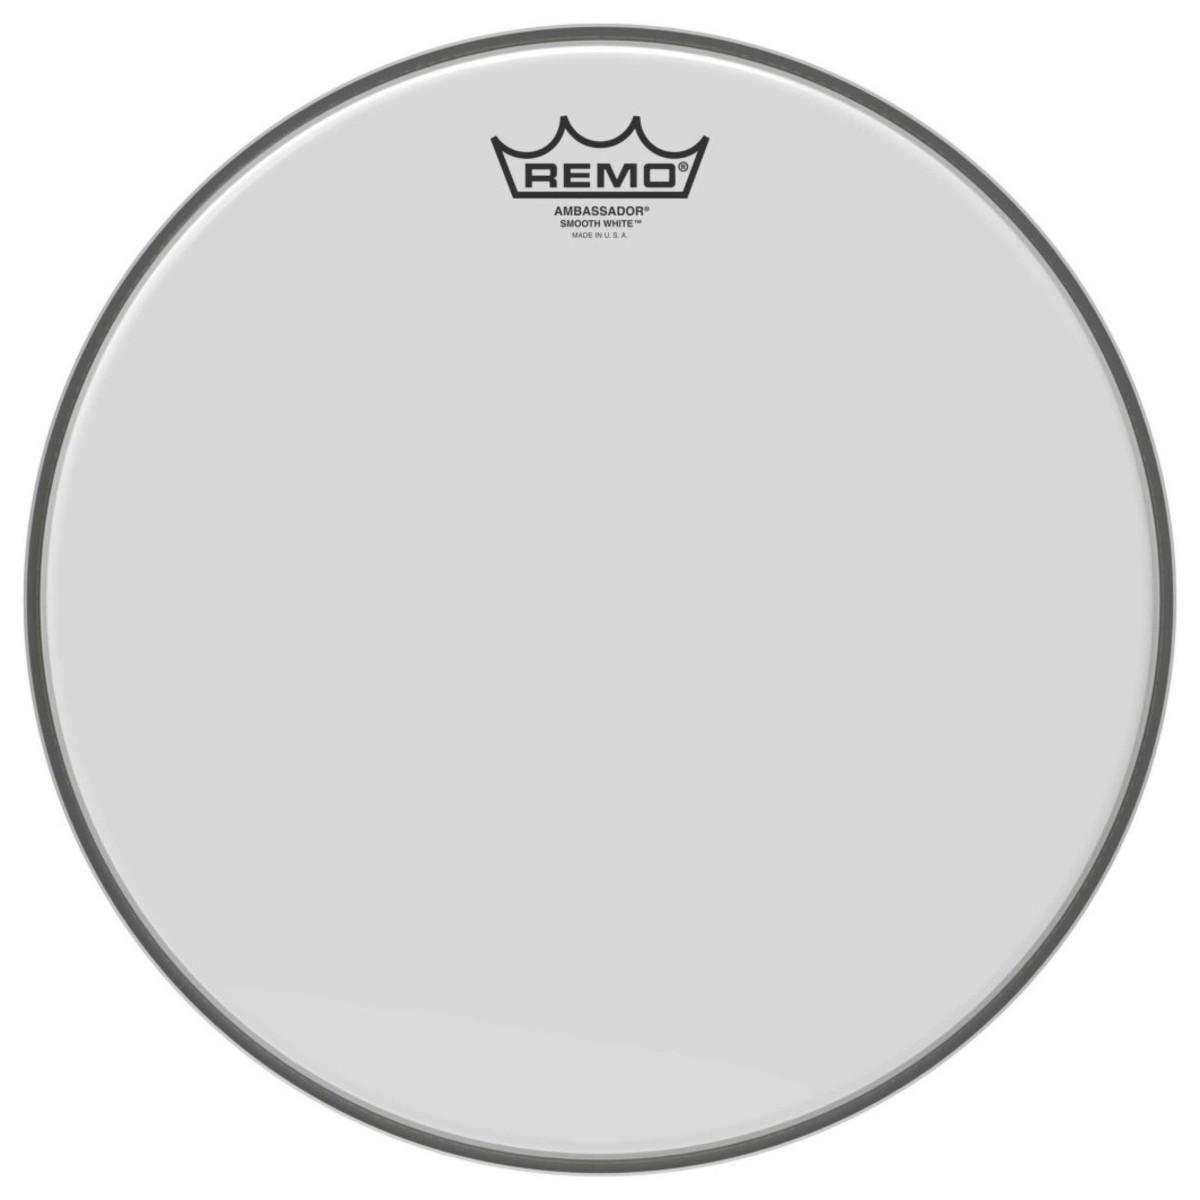 Remo Ambassador Smooth White 13 Drum Head